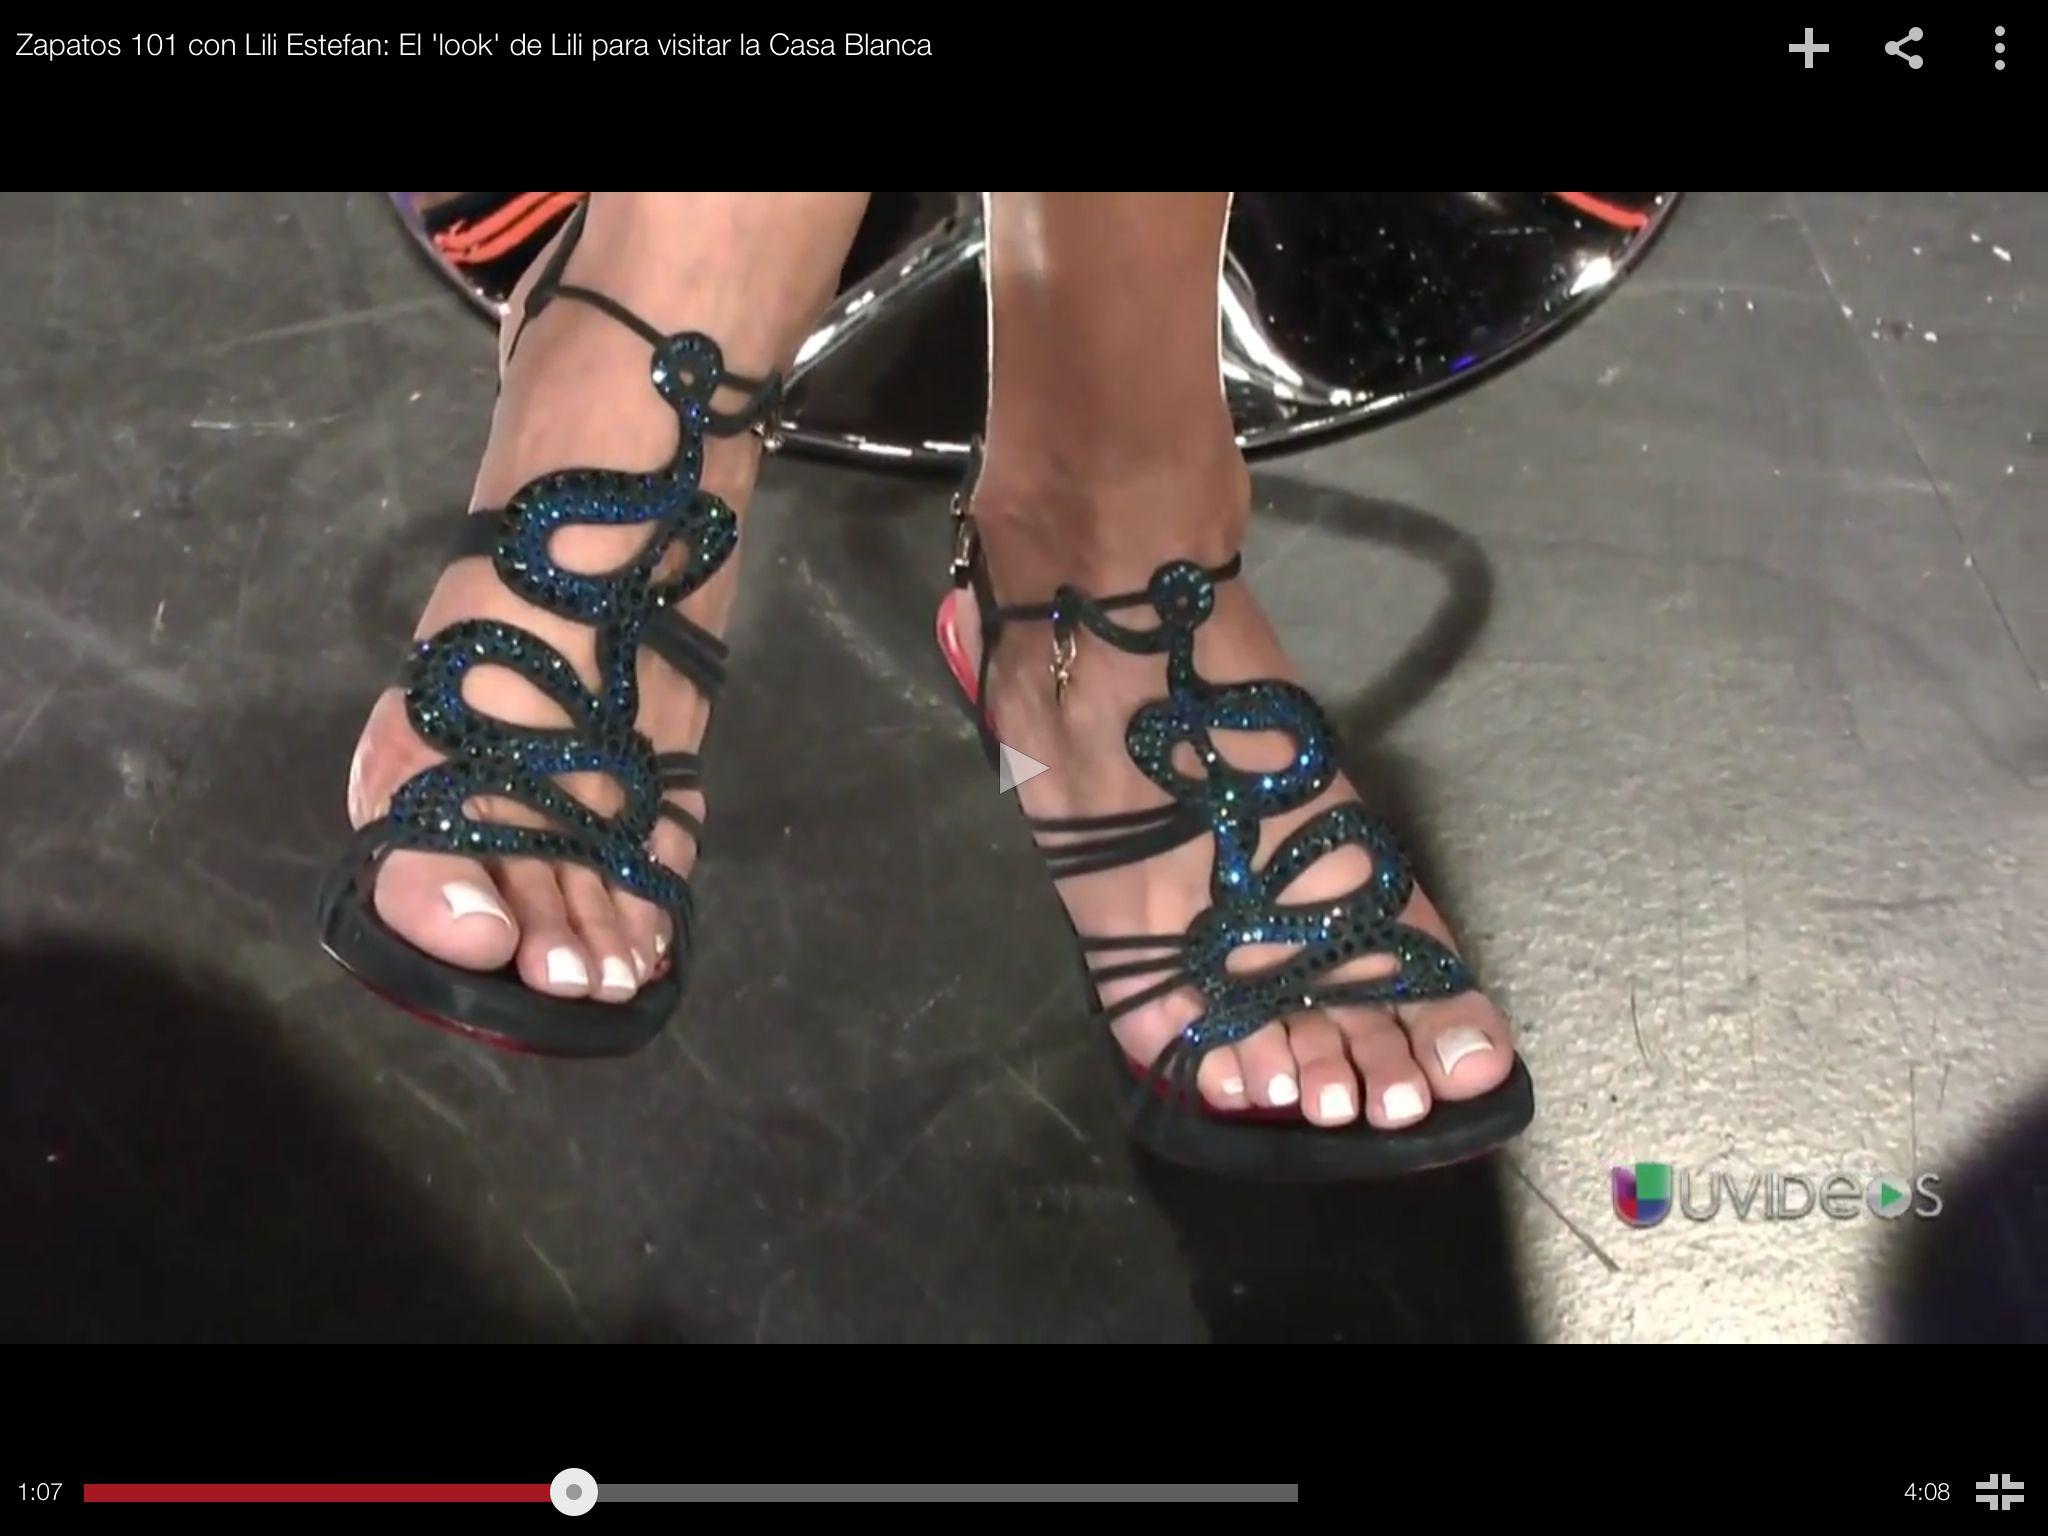 long toes lili estefan 2 pinterest